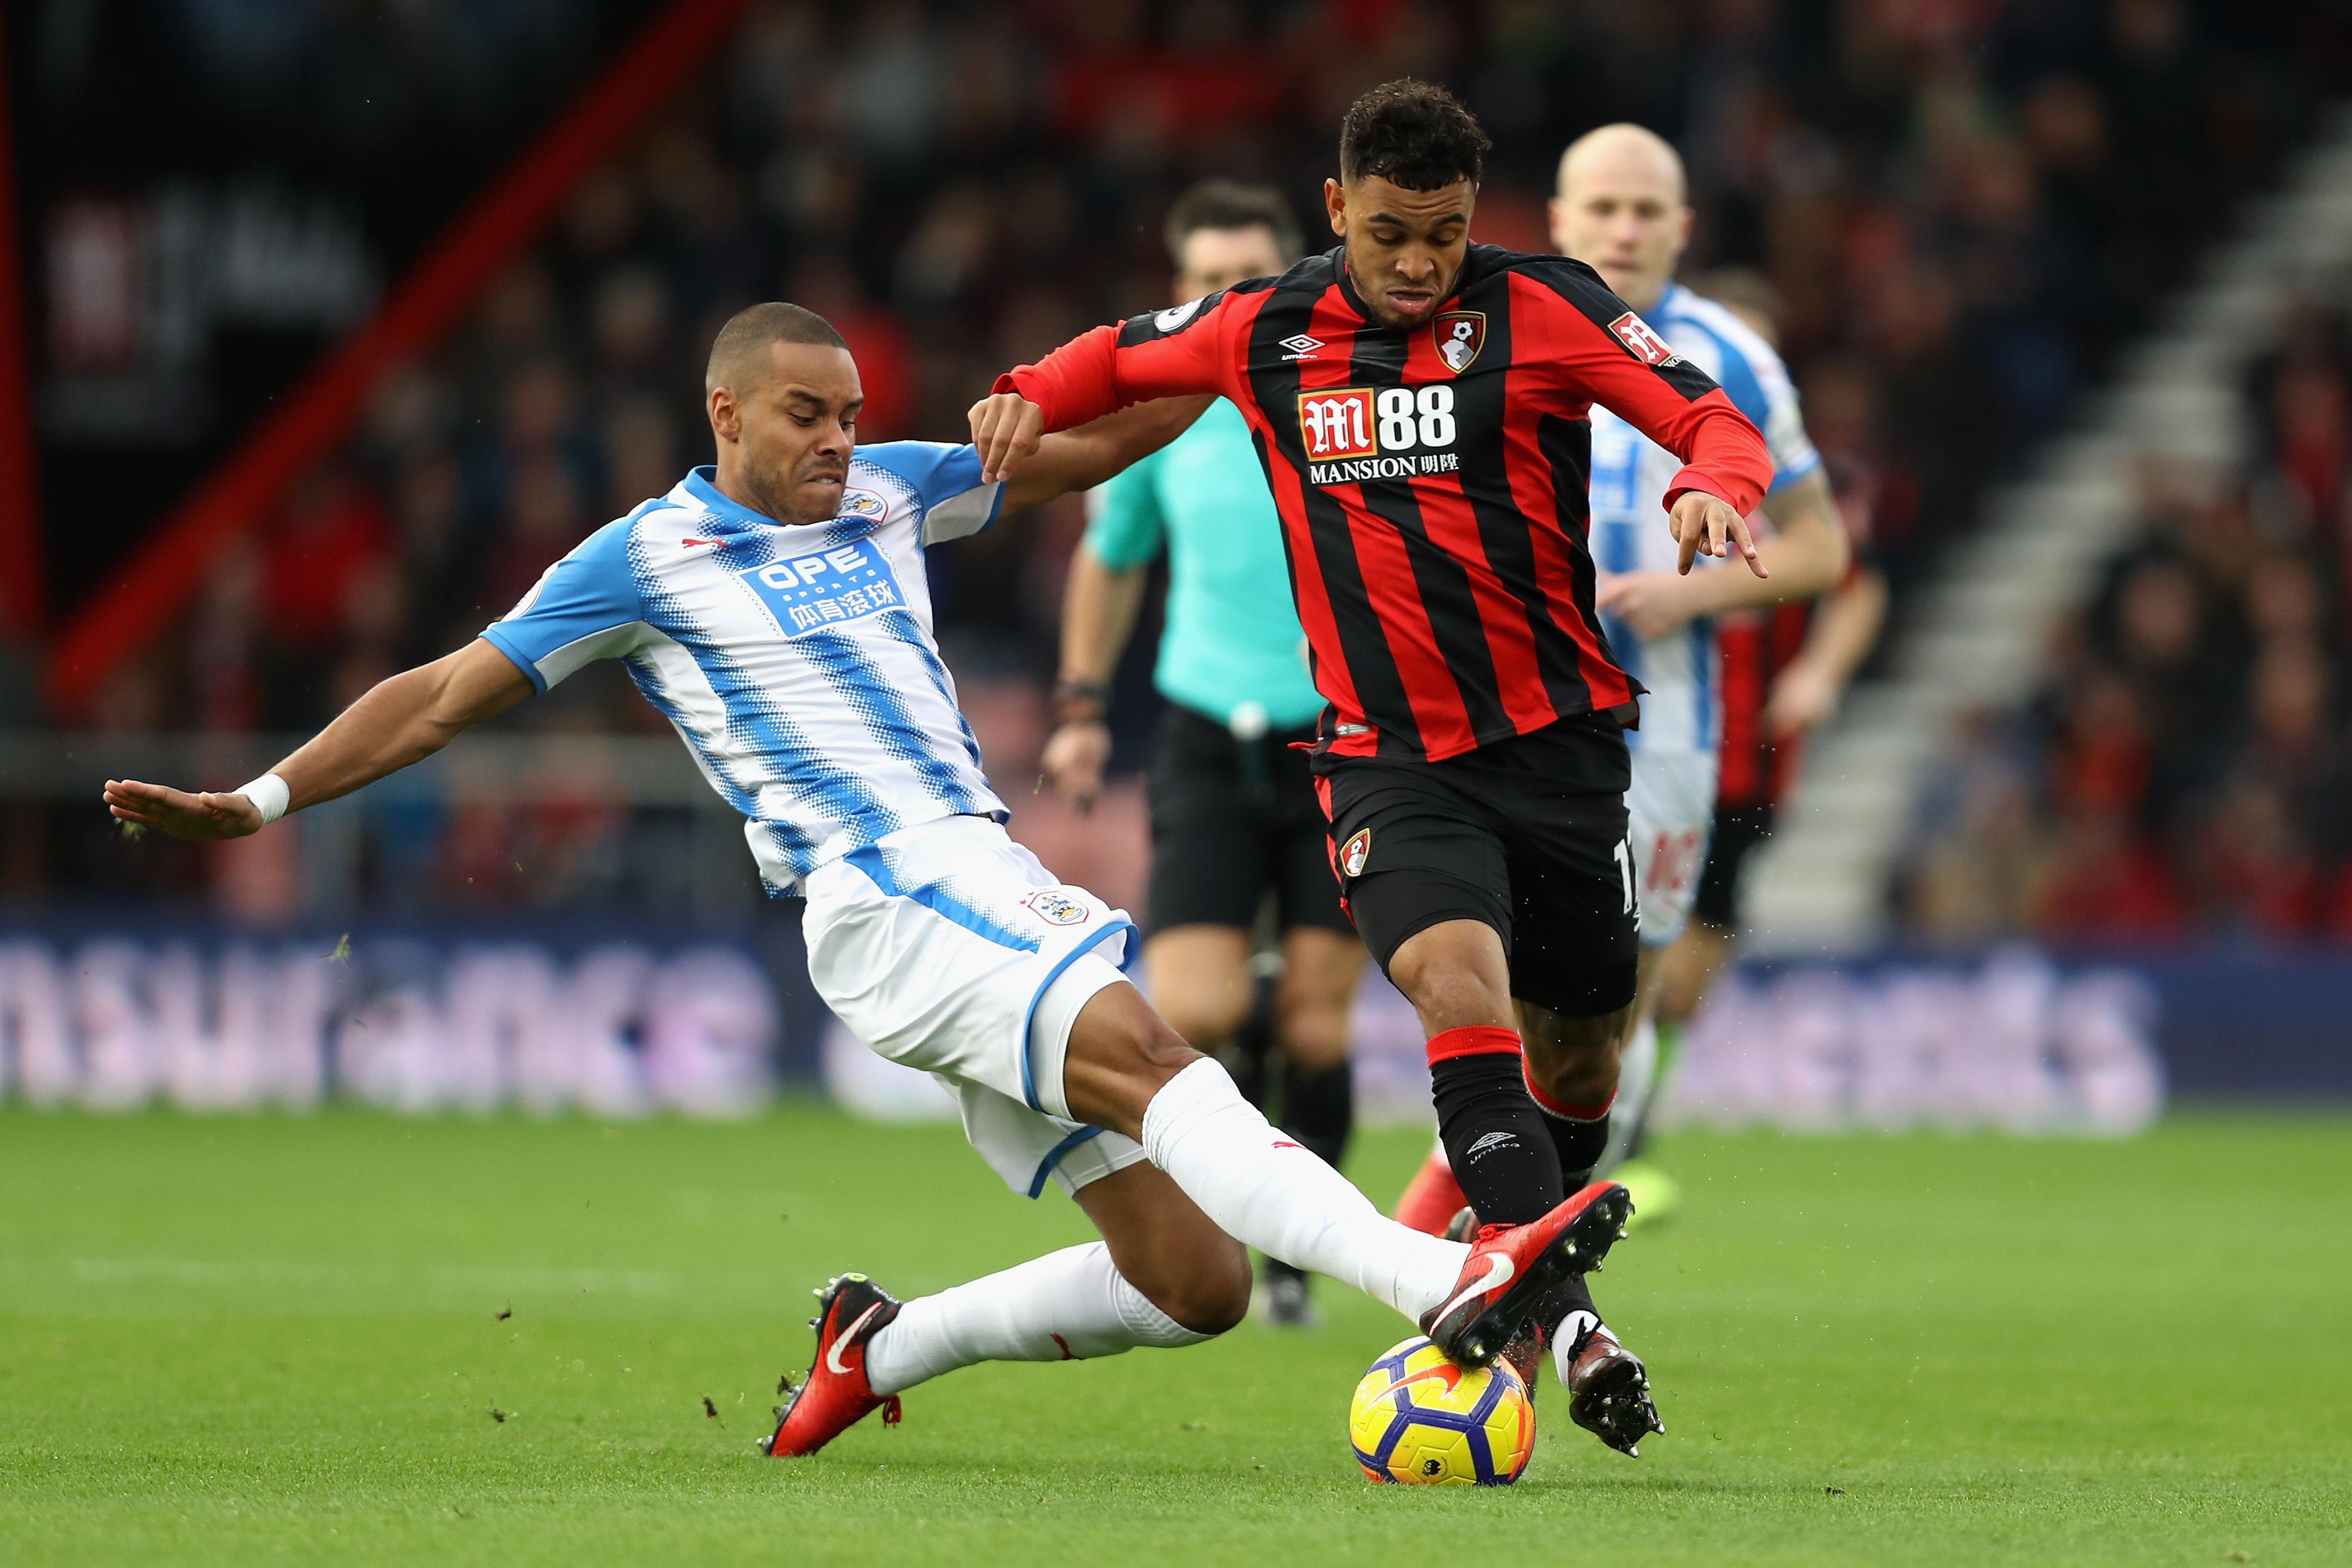 Huddersfield Vs Arsenal: Arsenal Vs Huddersfield Town: 5 Key Players To Watch